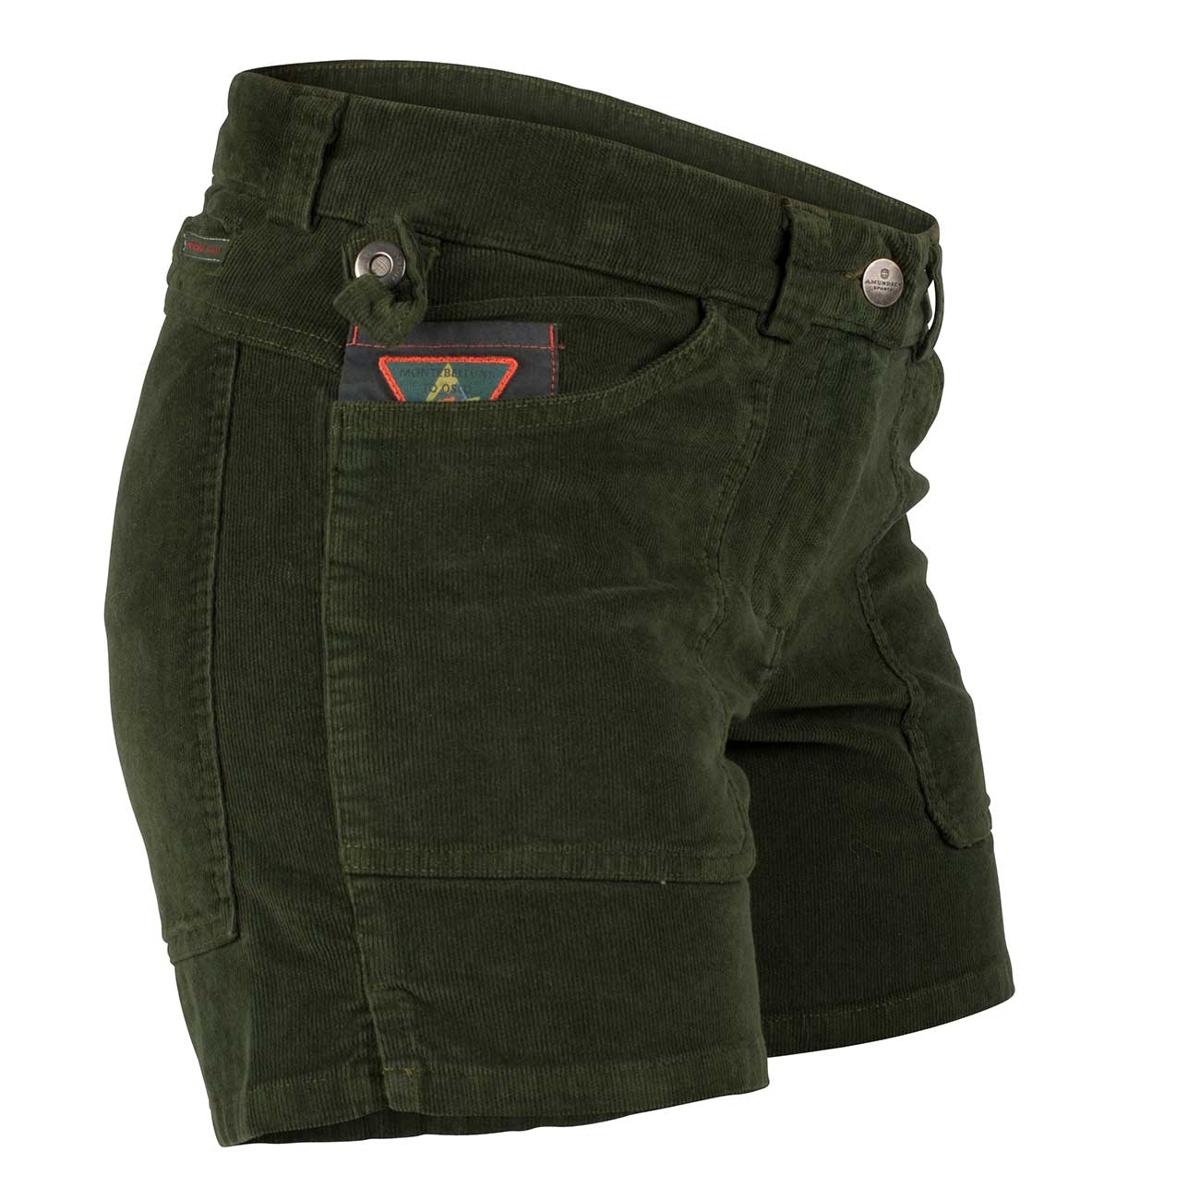 Bilde av Amundsen W 5incher concord shorts g. dyed womens WSS60.1.450